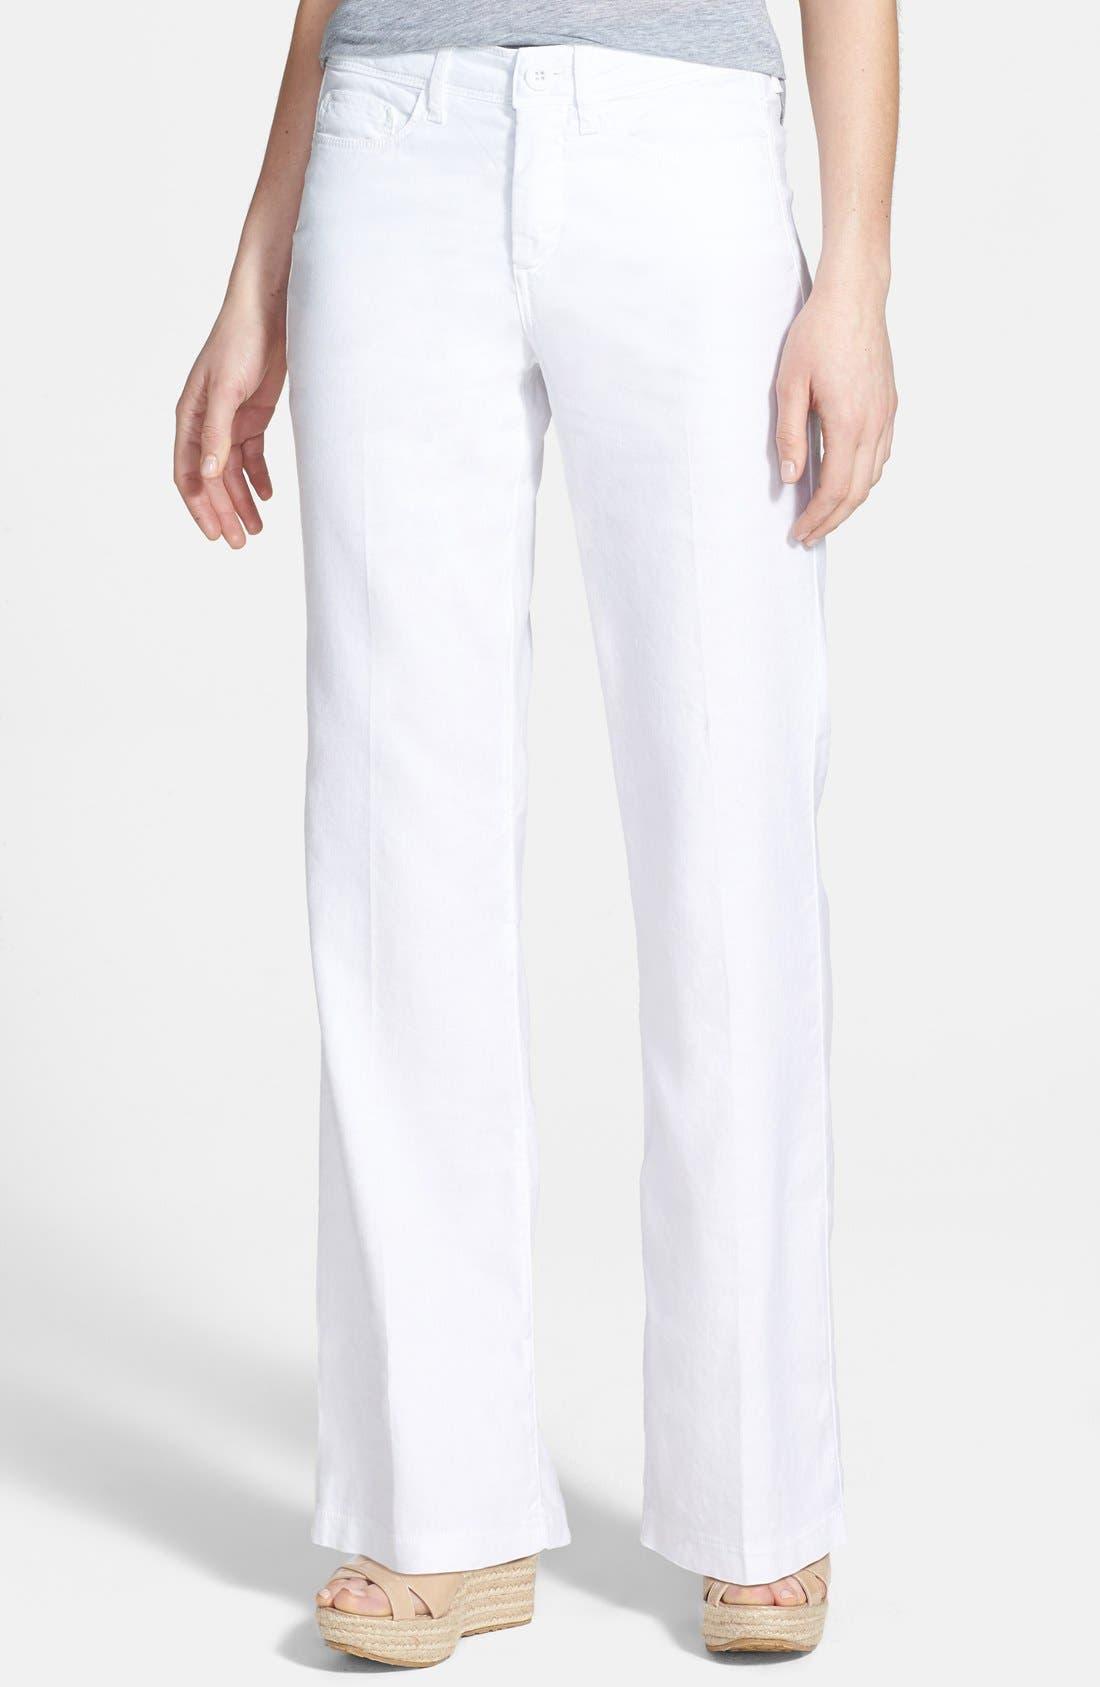 Main Image - NYDJ 'Wylie' Stretch Linen Trousers (Plus Size)